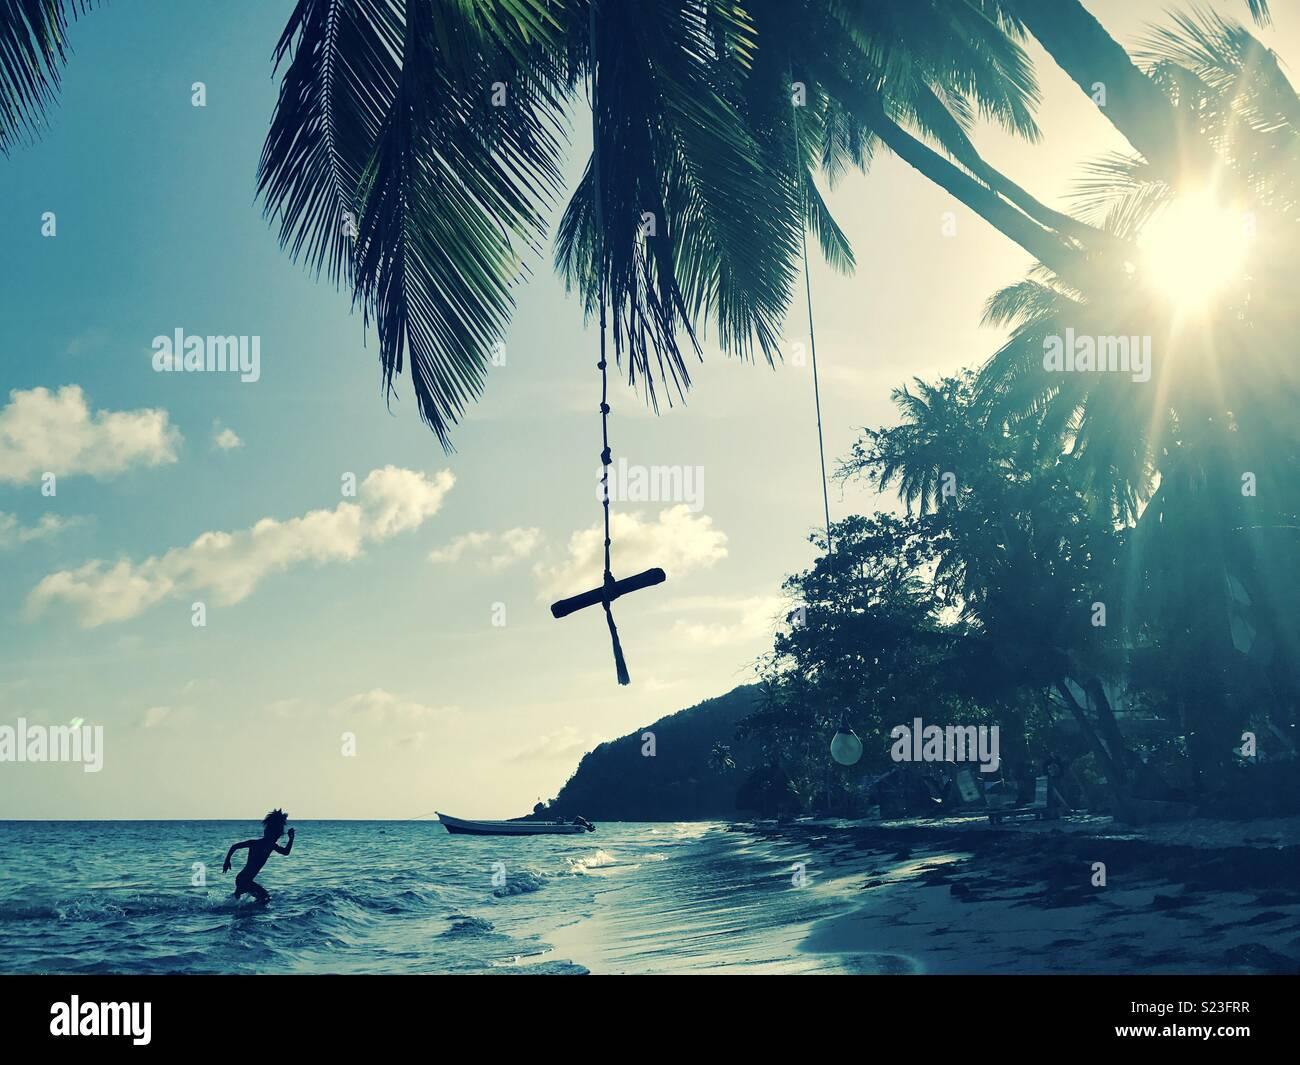 Caribbean Beach Szene auf Providencia Island, eine kolumbianische Insel in der Karibik. Stockbild